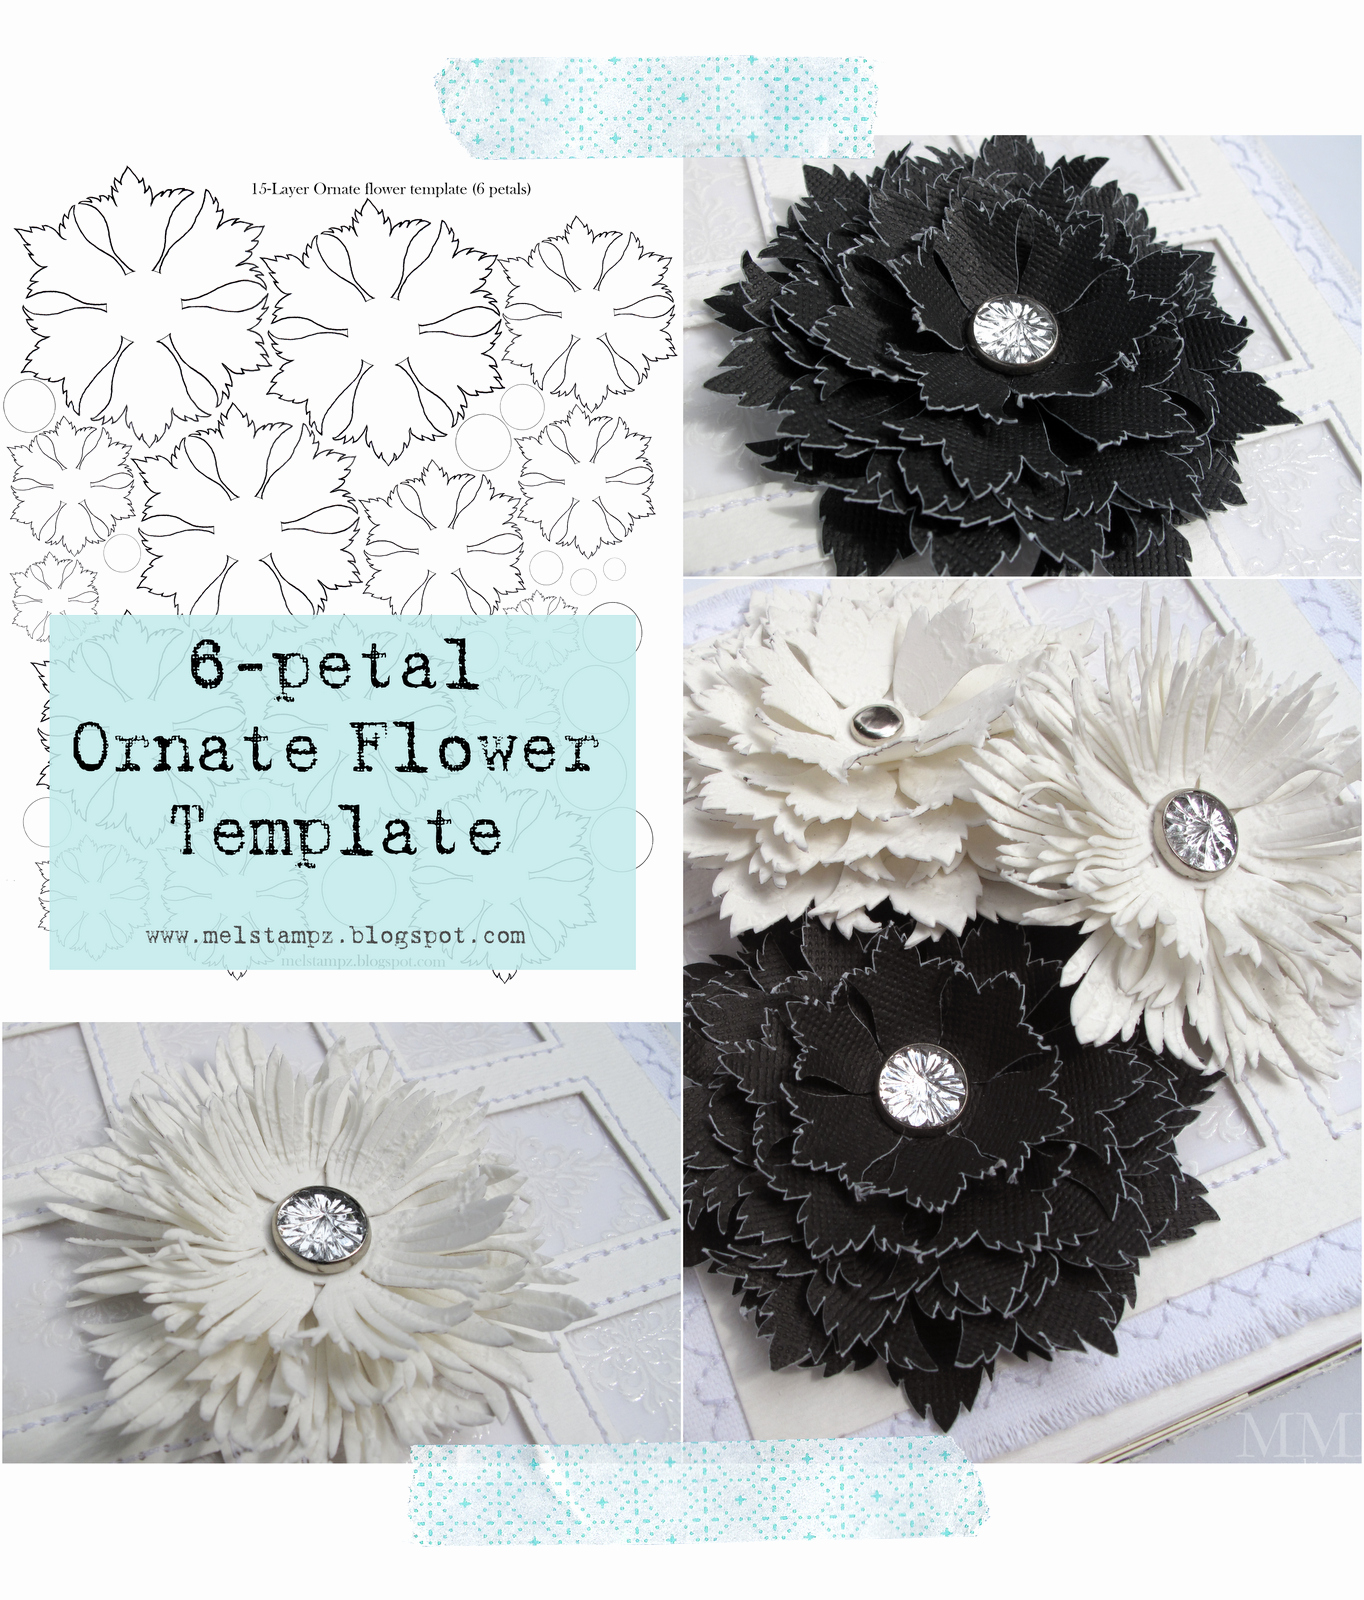 Paper Flower Petal Template Beautiful Mel Stampz 6 Petal ornate Flower Template